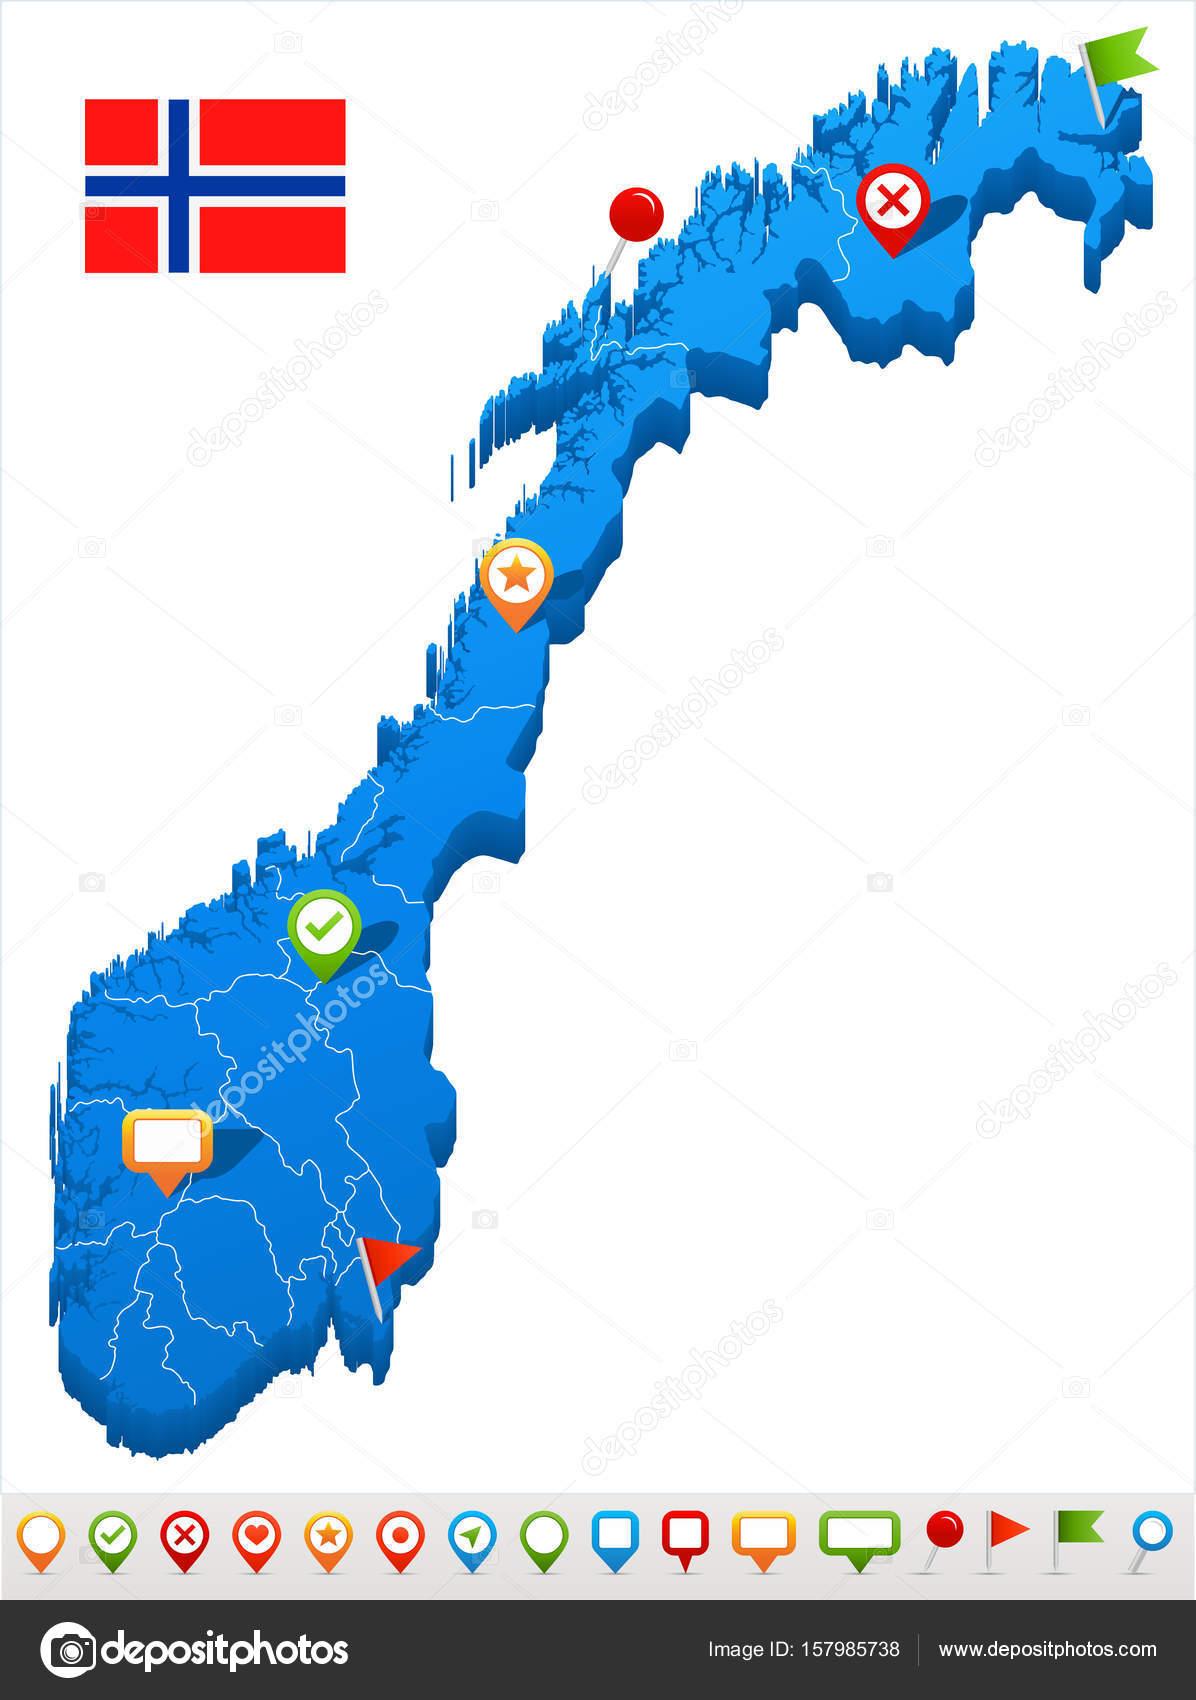 Karte Norwegen.Norwegen Karte Und Flagge Abbildung Stockvektor